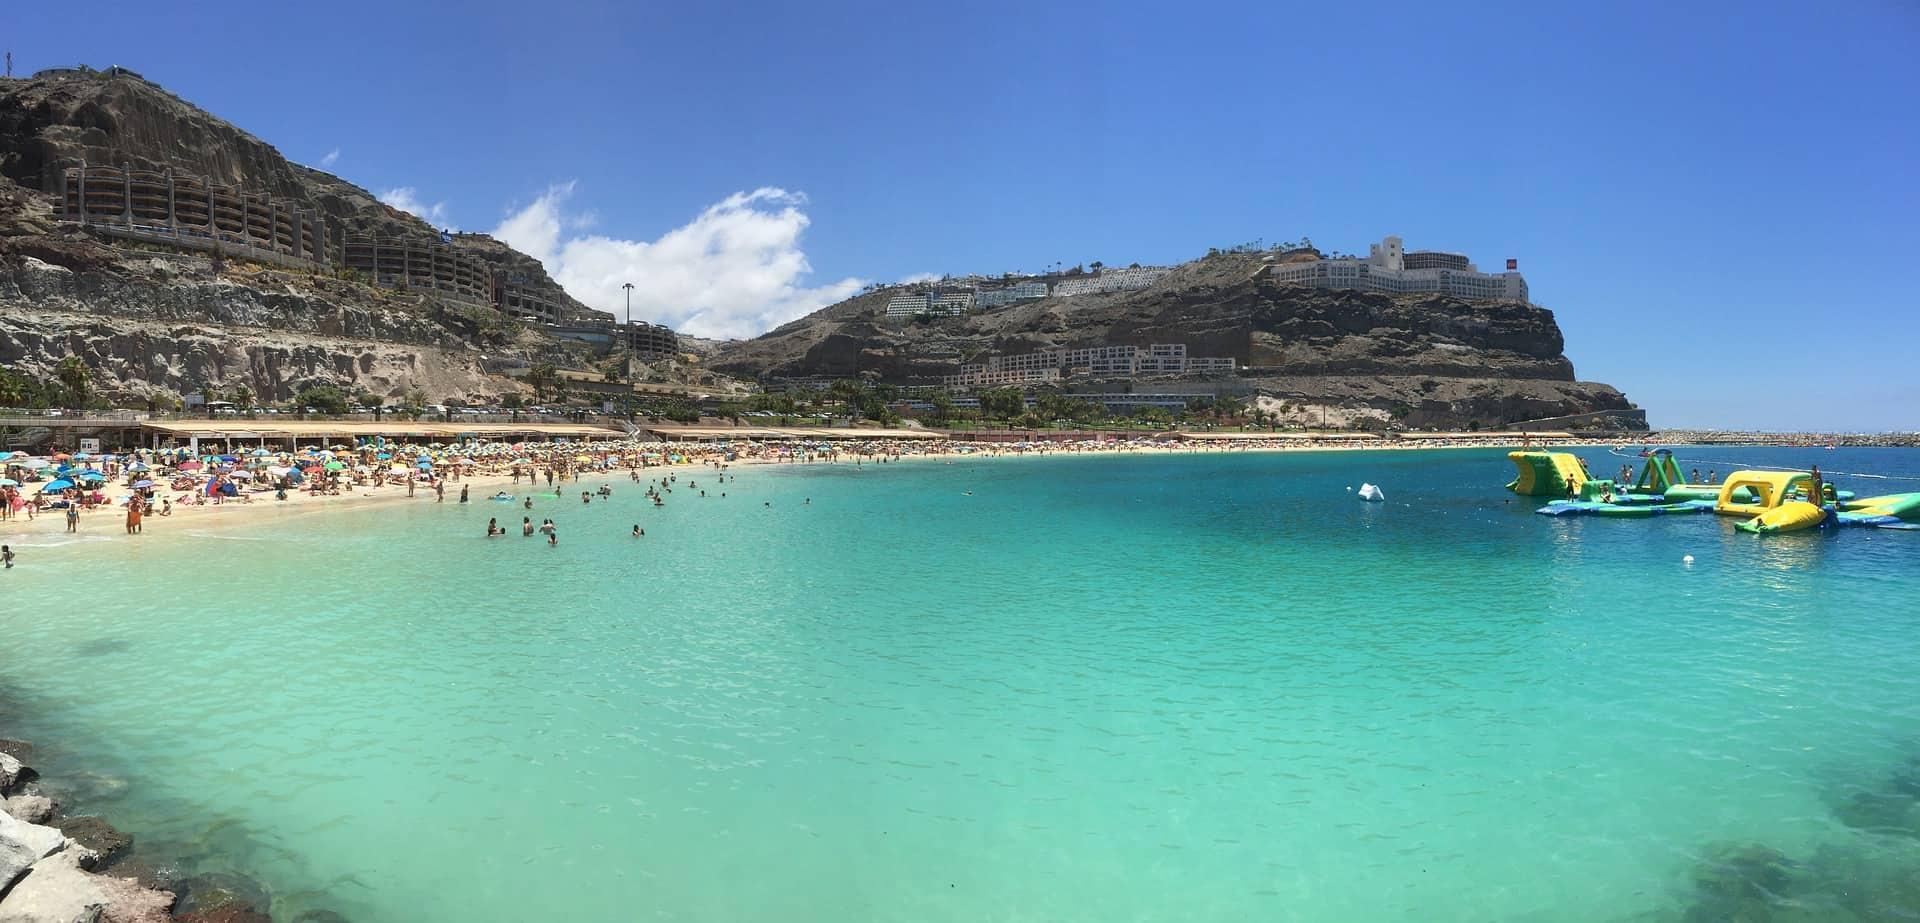 All Inclusive Gran Canaria Deals ab 345,00€ Ferien auf den Kanaren